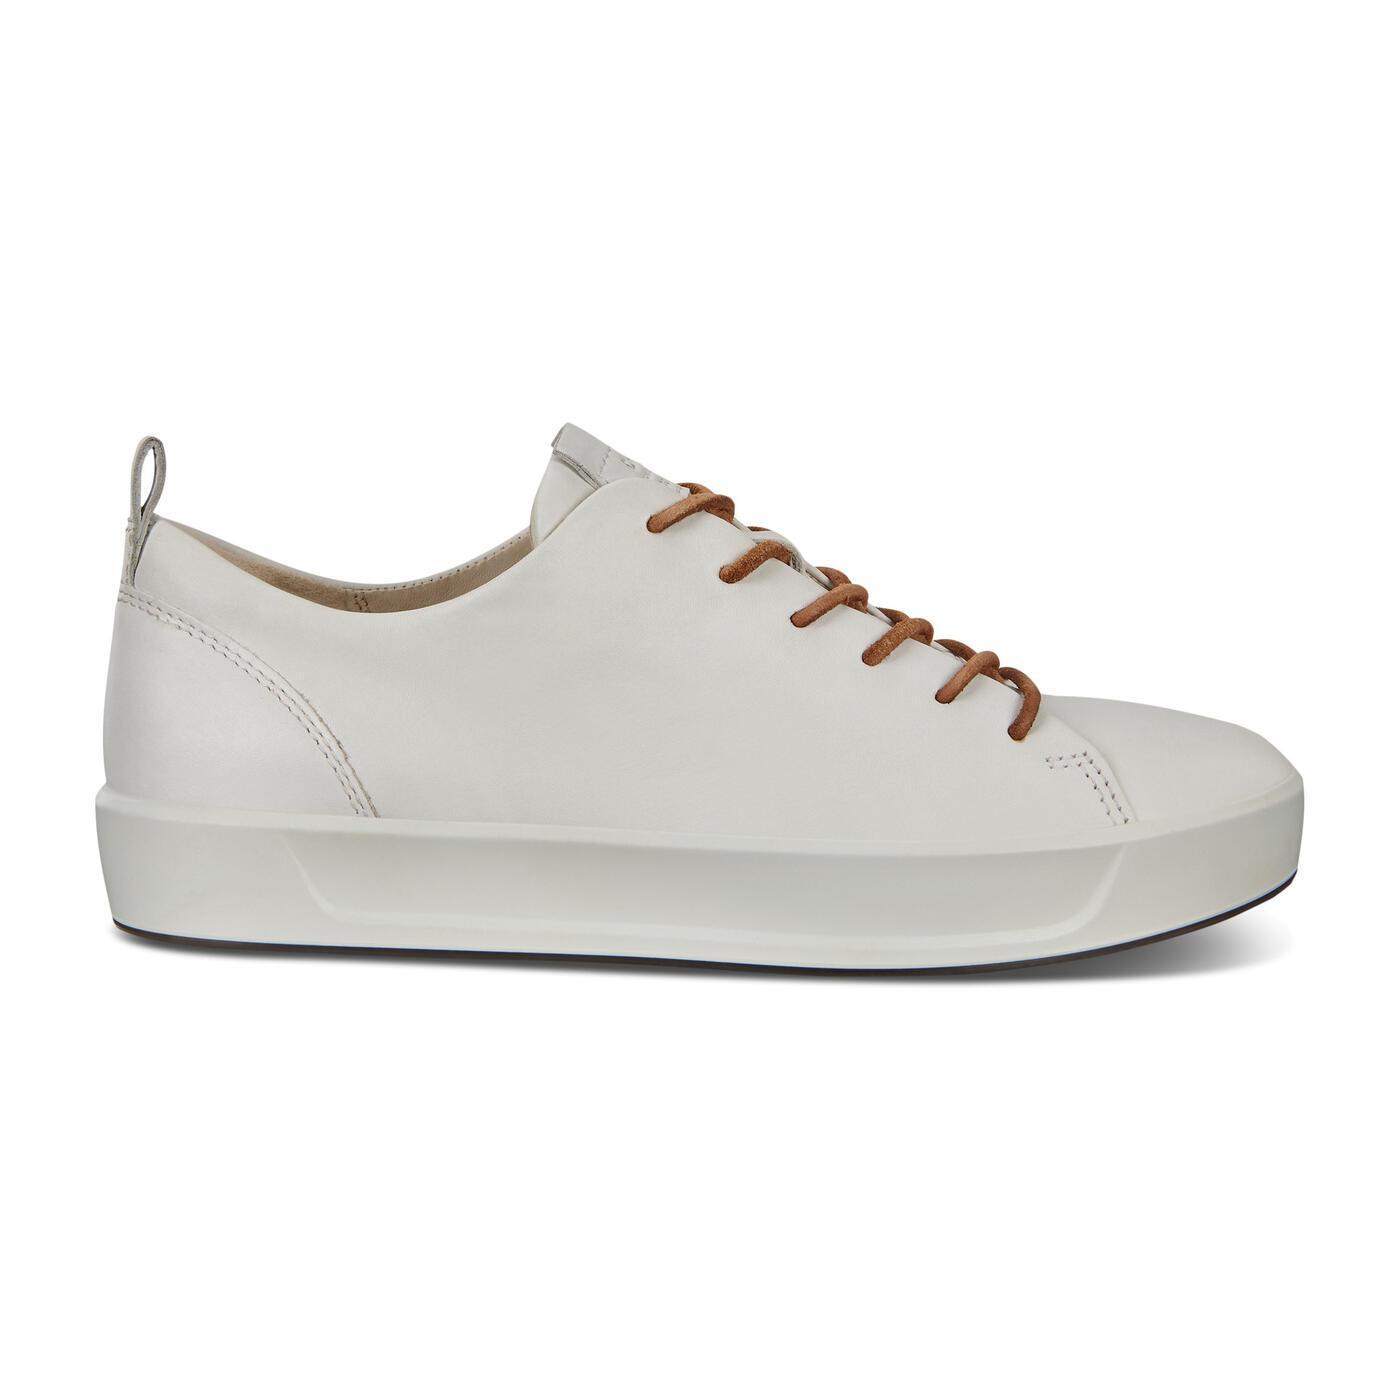 Womens ECCO Sneakers | SOFT 8 Sneakers